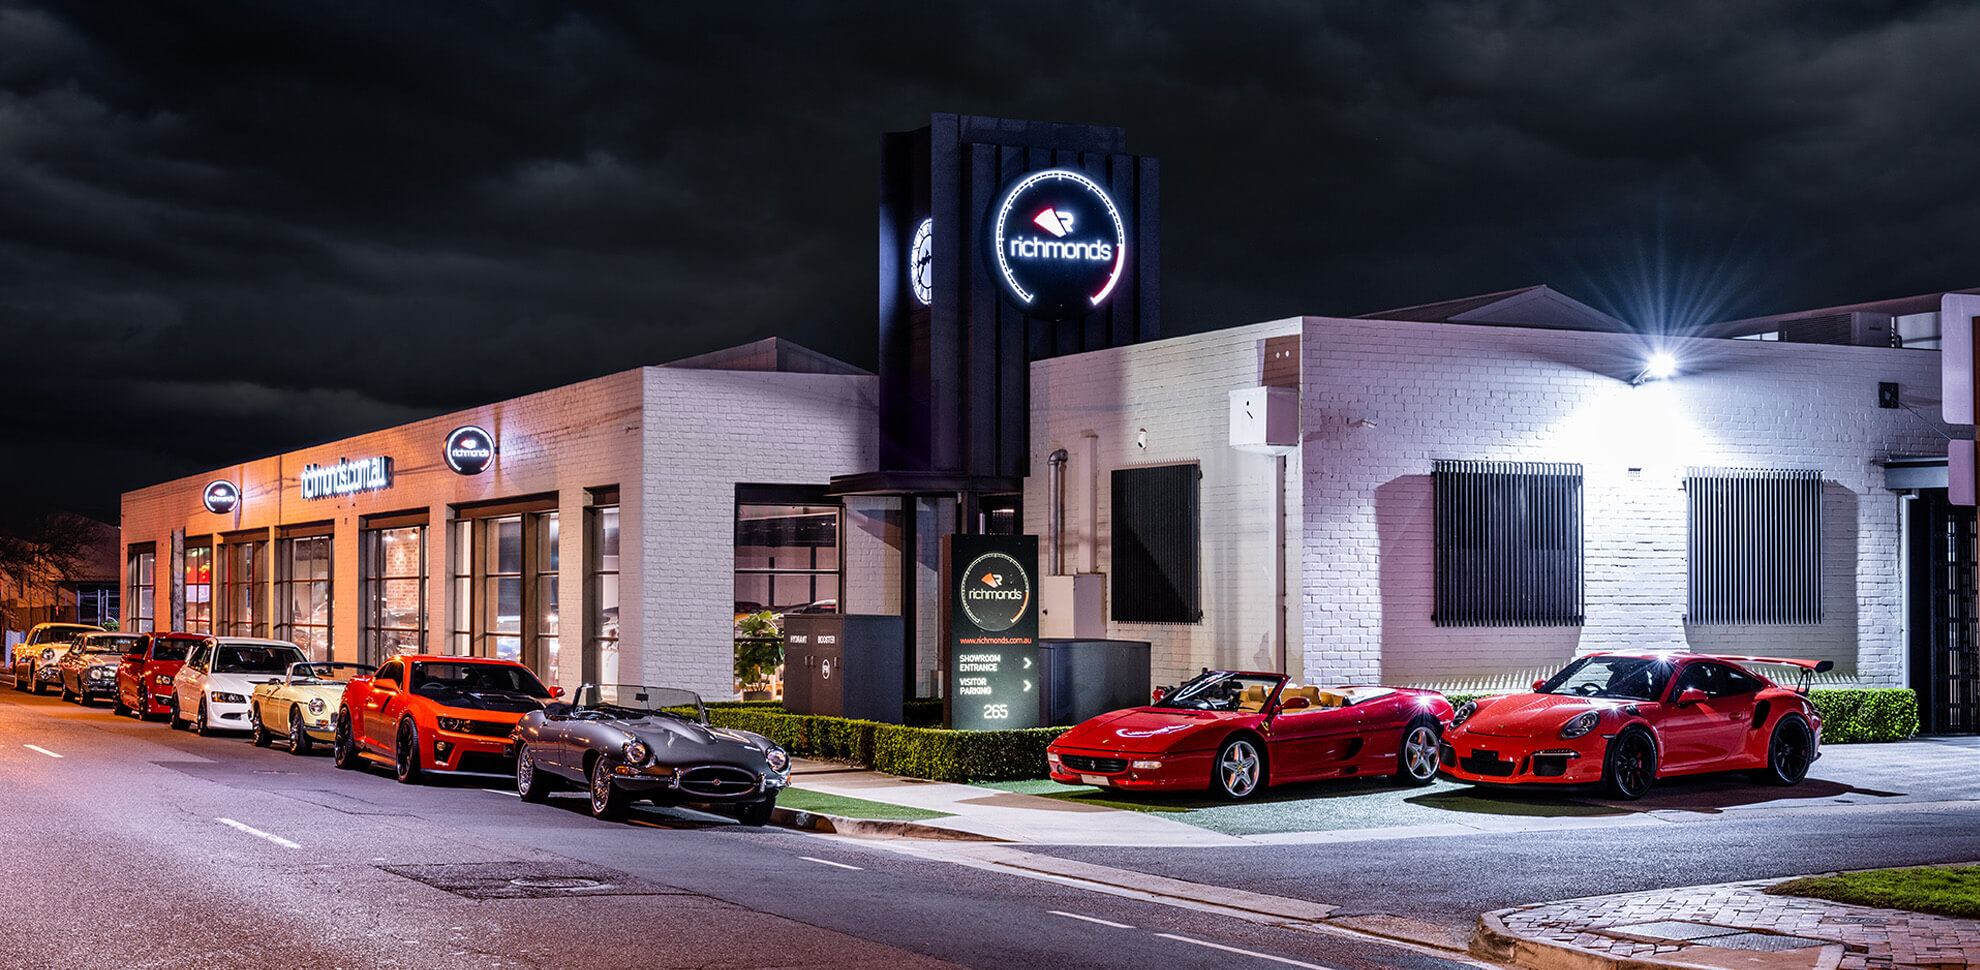 Richmonds Classic & Prestige Cars Adelaide